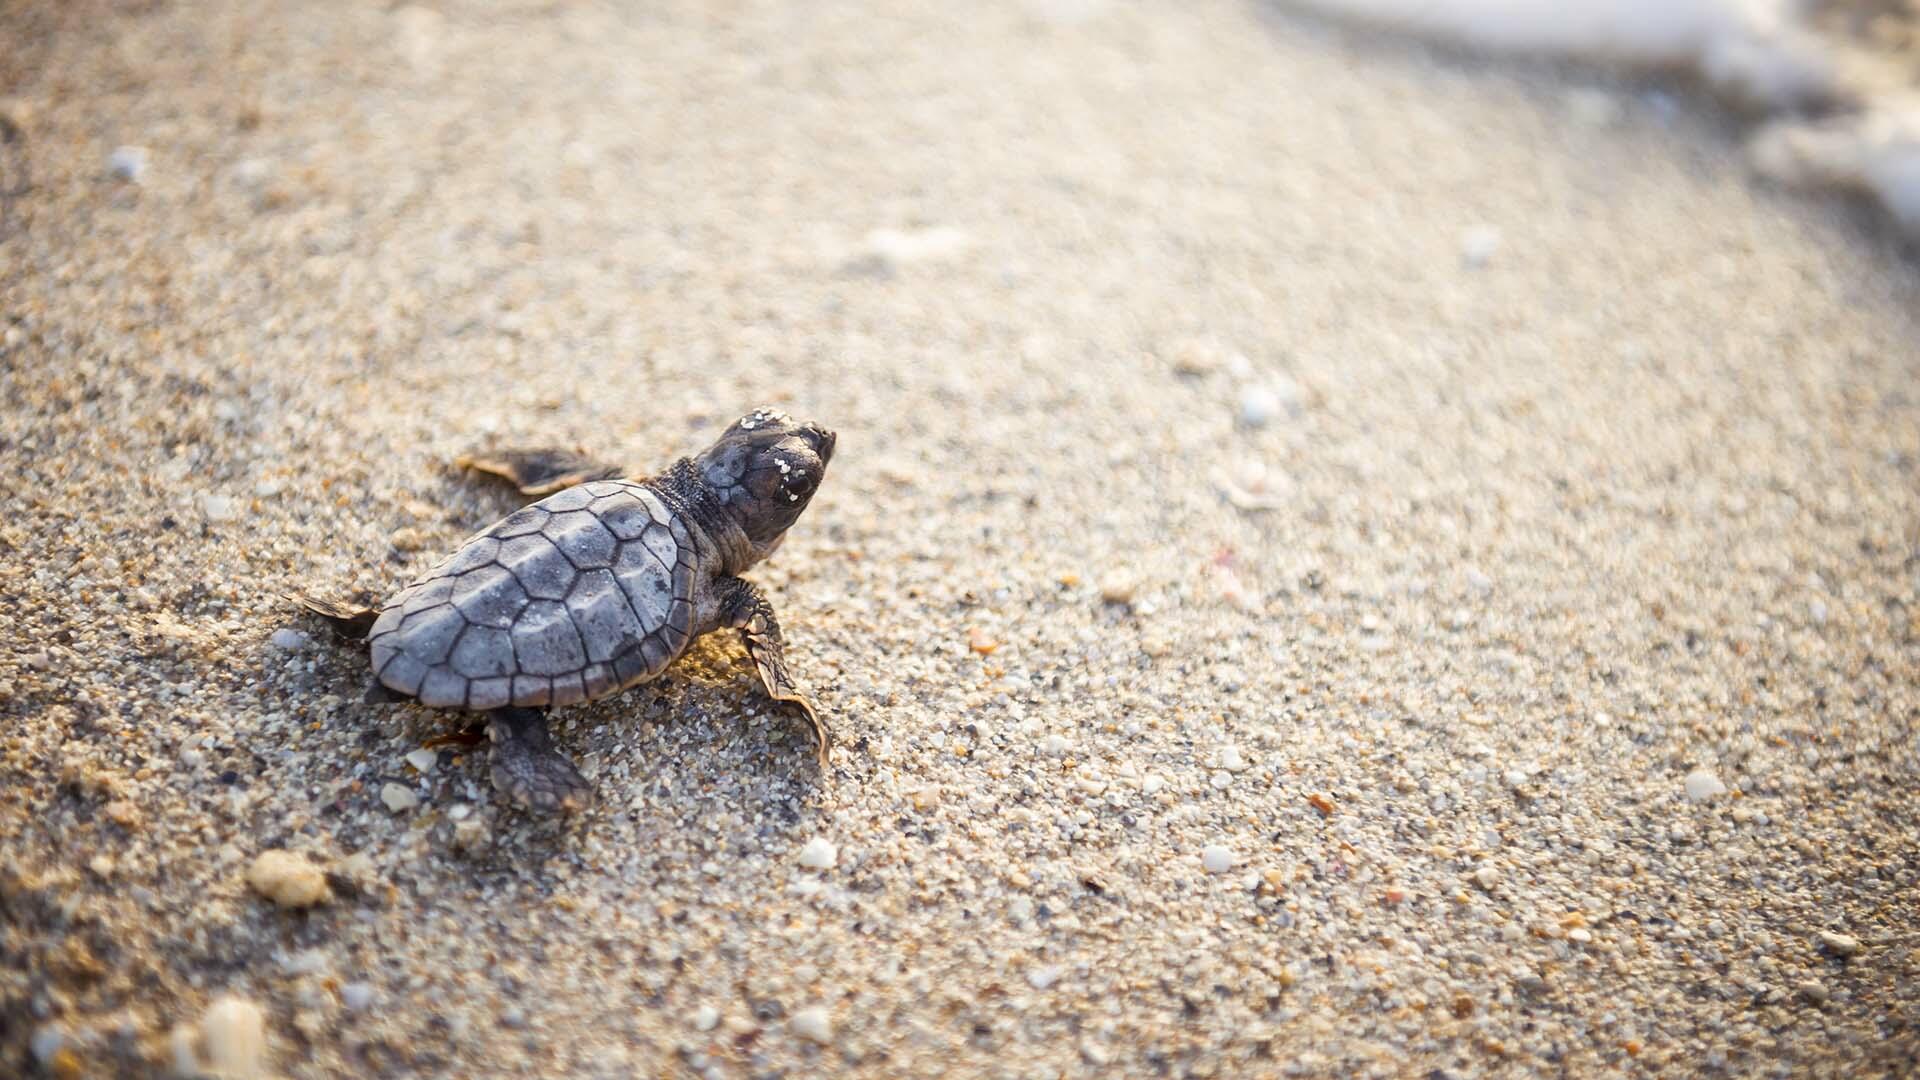 Sea turtle on the sand in Daytona Beach, Florida